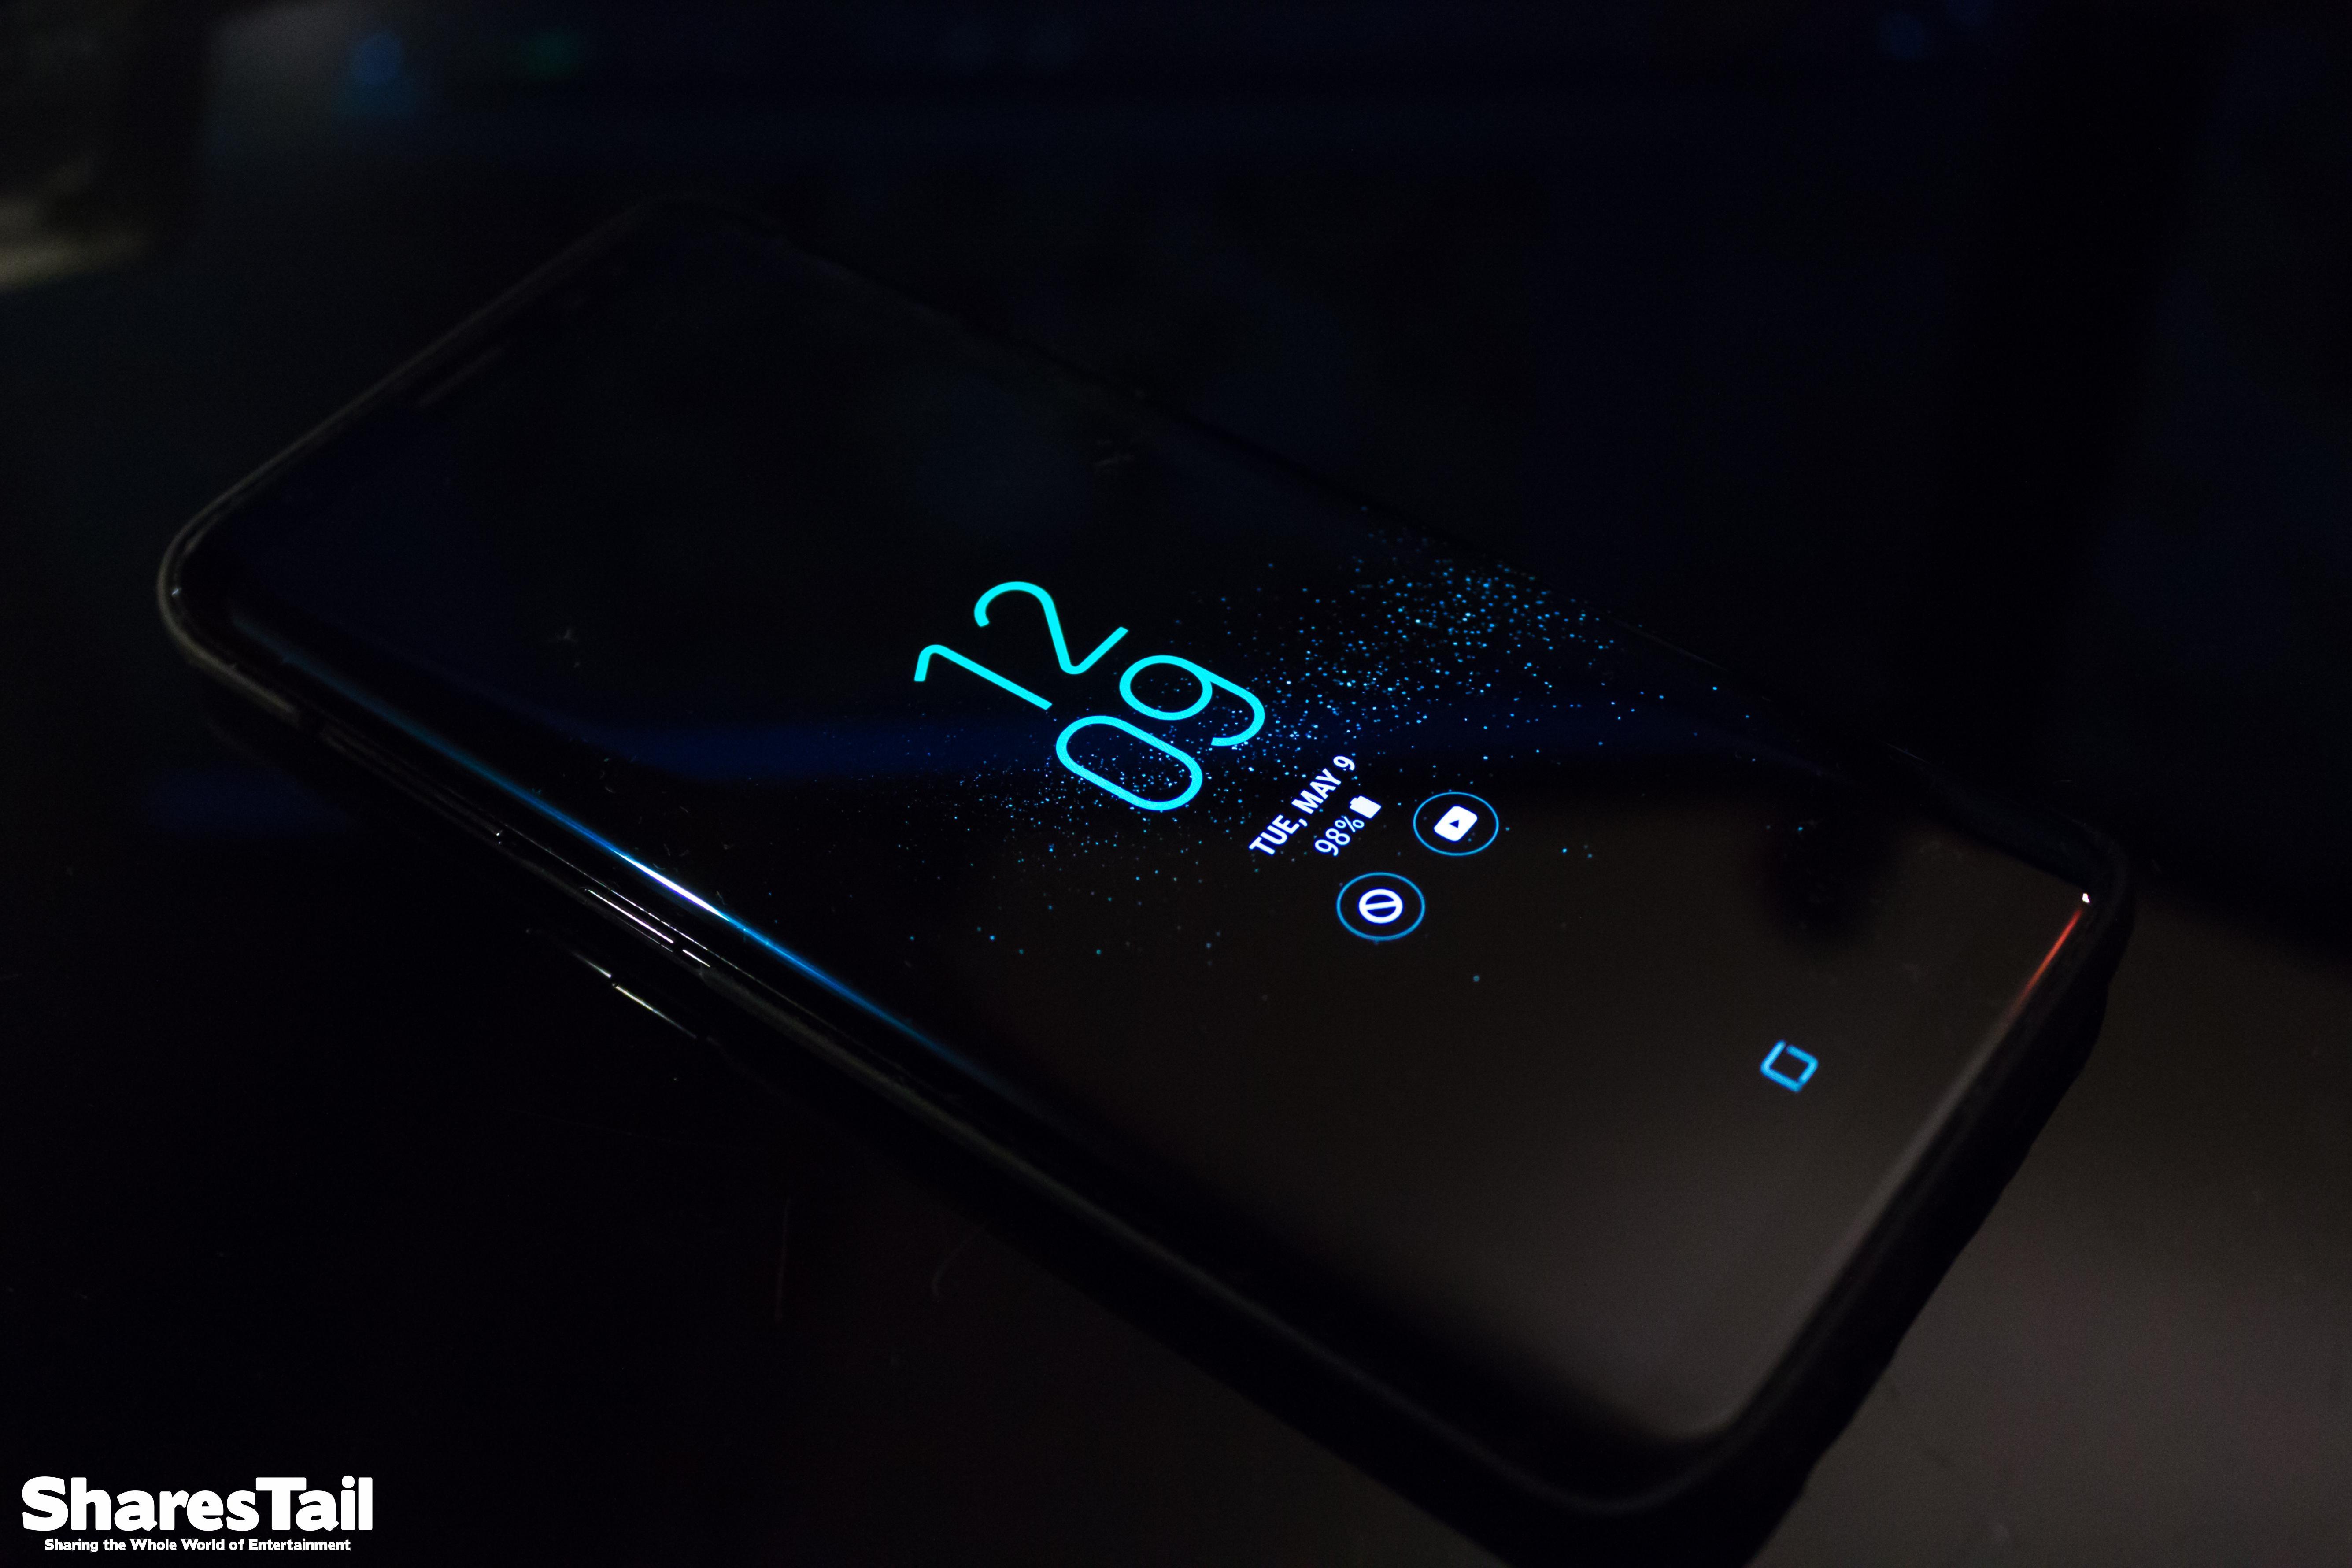 Samsung Galaxy S8 1080p HD Wallpaper Album on Imgur